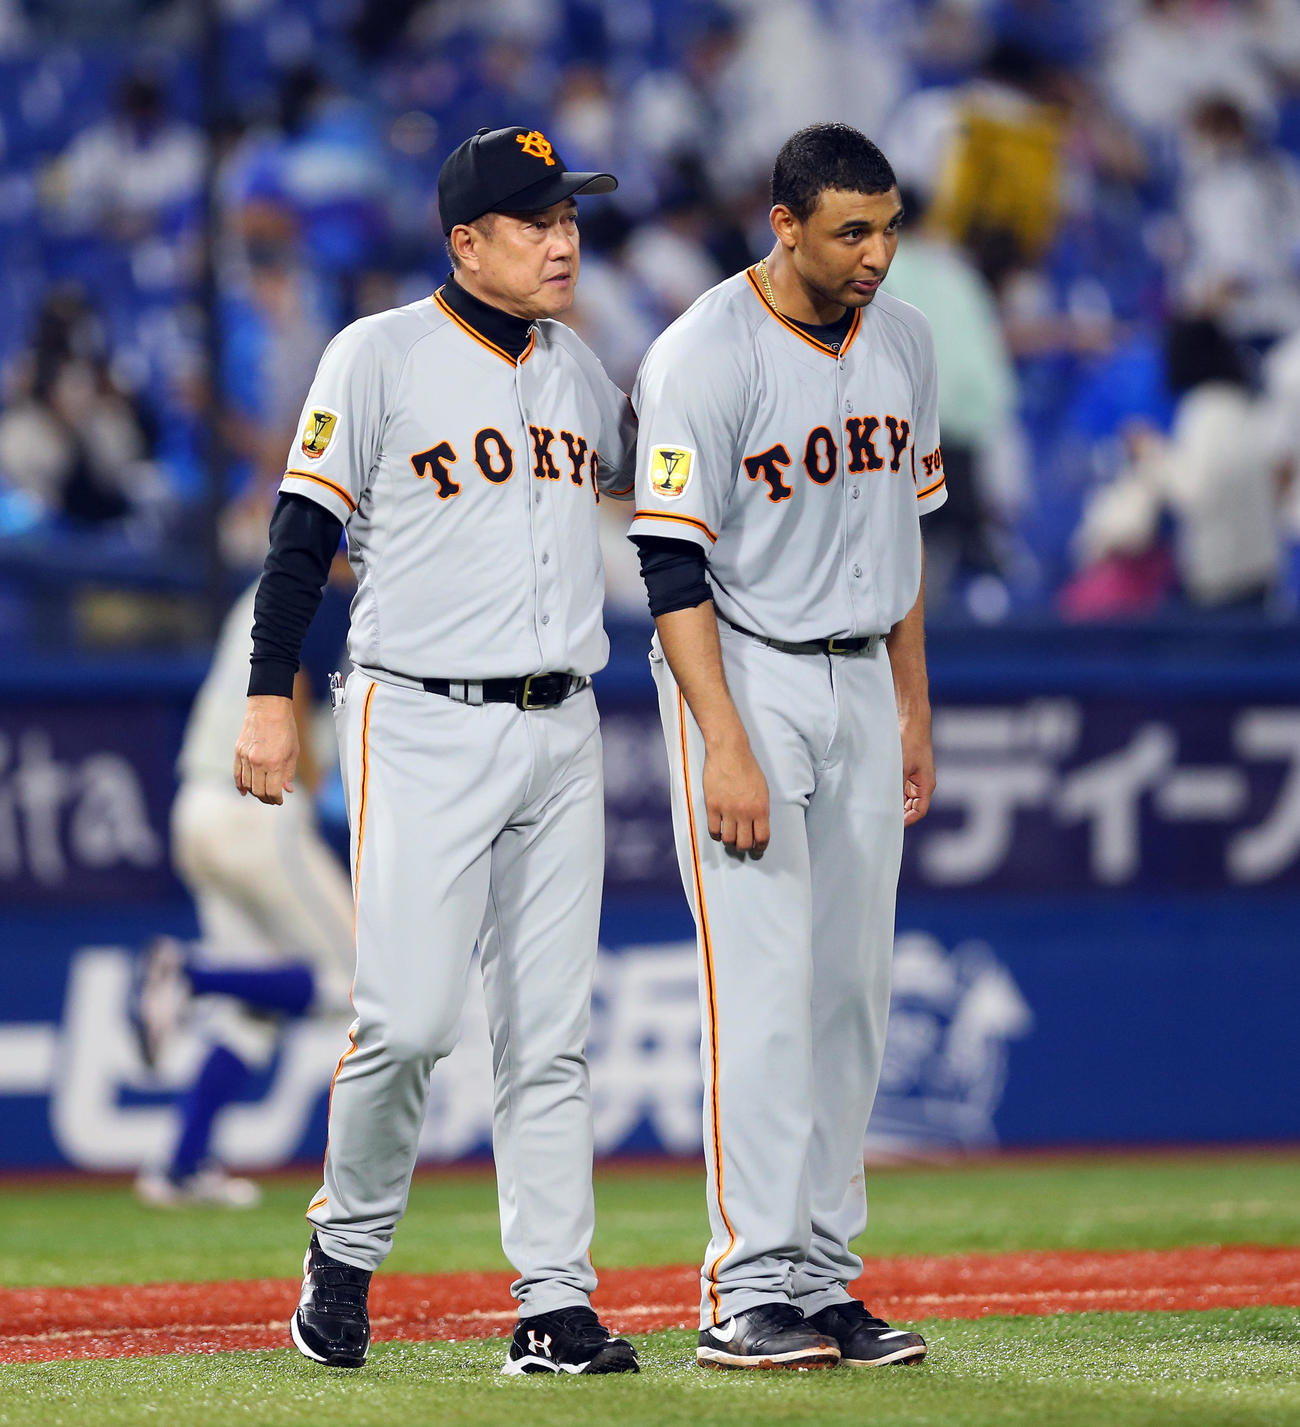 DeNA対巨人 試合に勝利し、巨人サンチェス(右)の肩をたたく原監督(撮影・大野祥一)